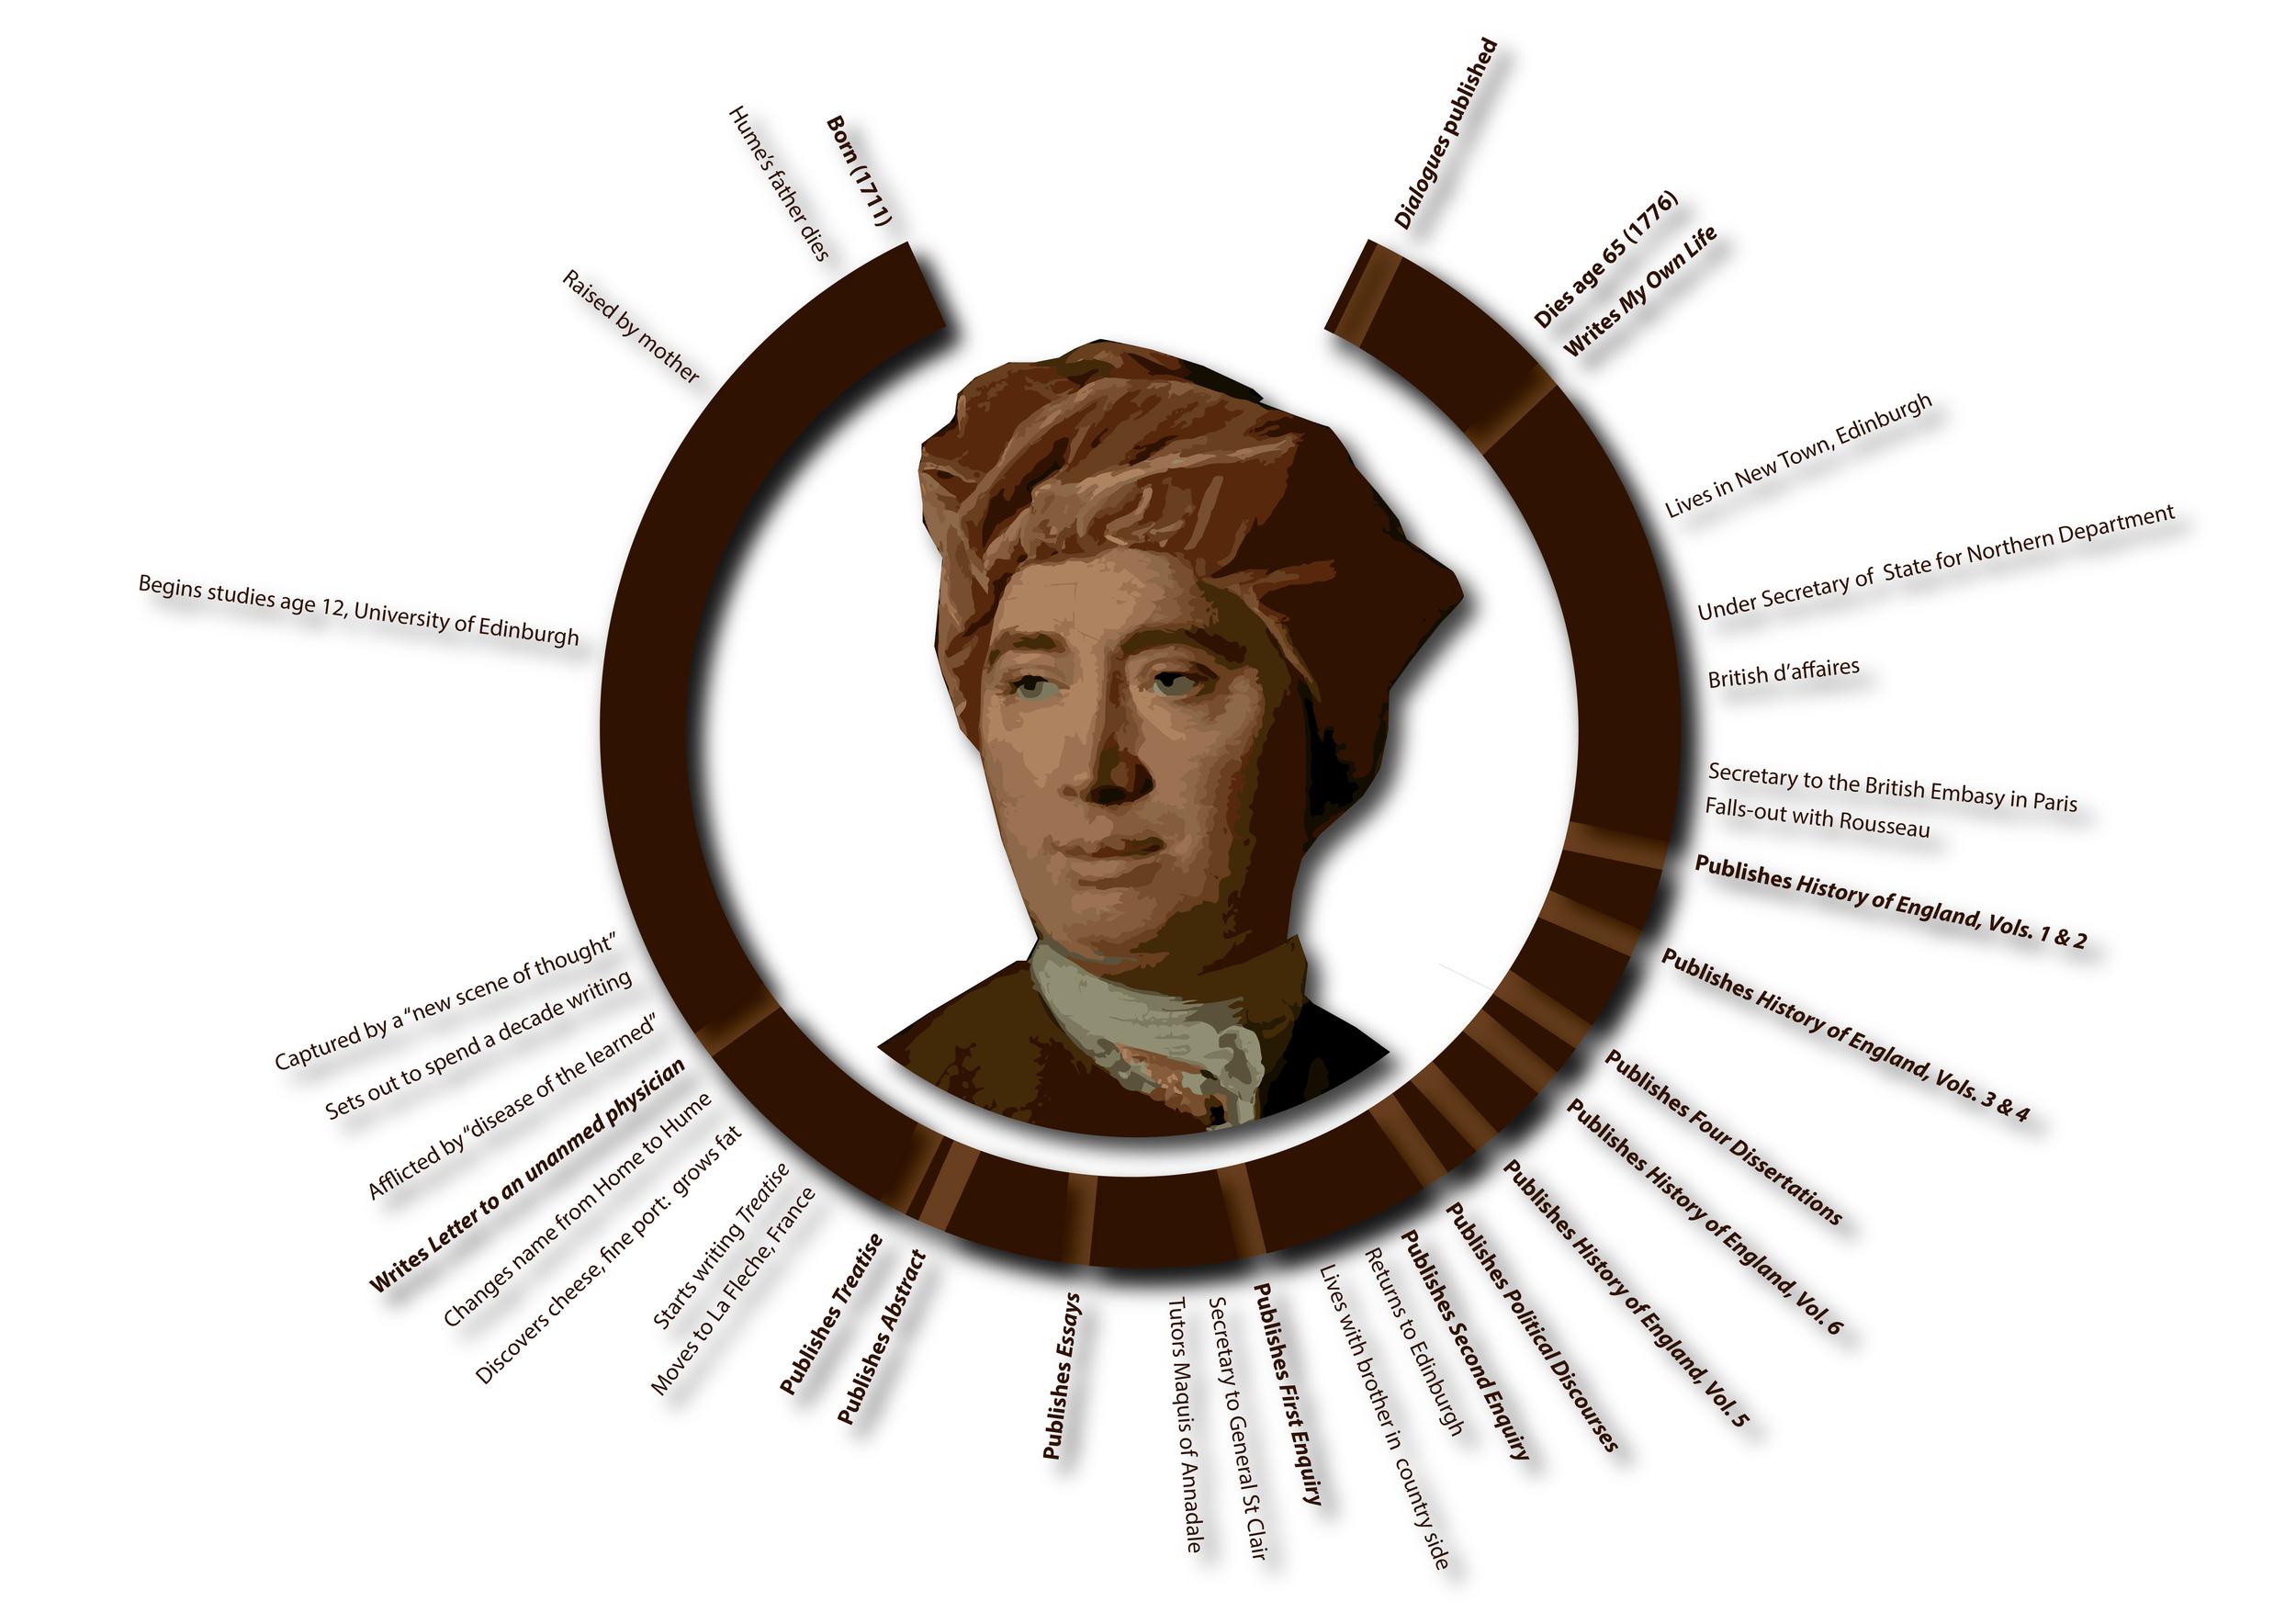 Hume biographic